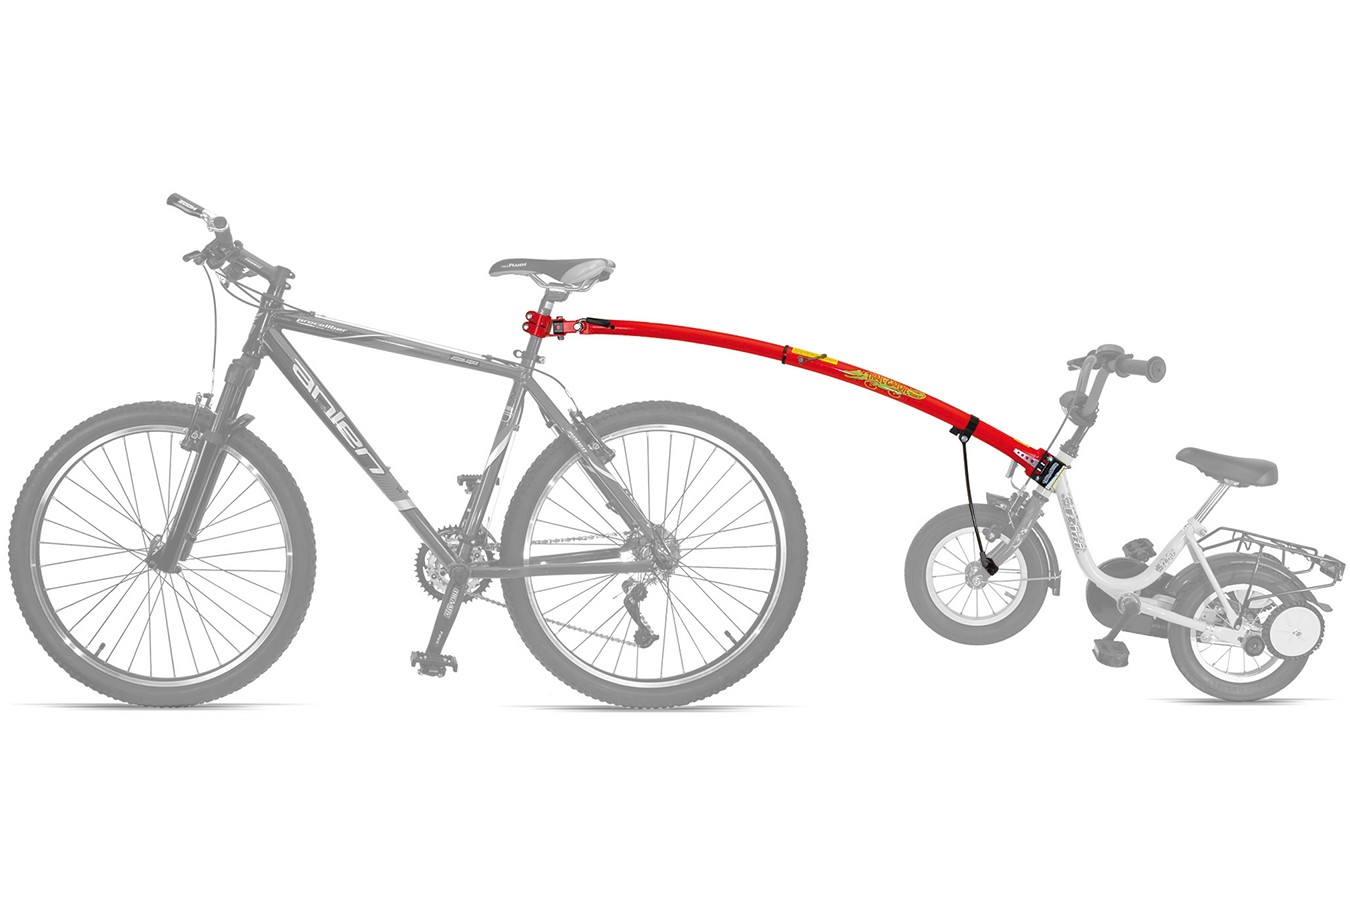 Suporte Reboque para Bike Infantil Trail Gator - M-Wave